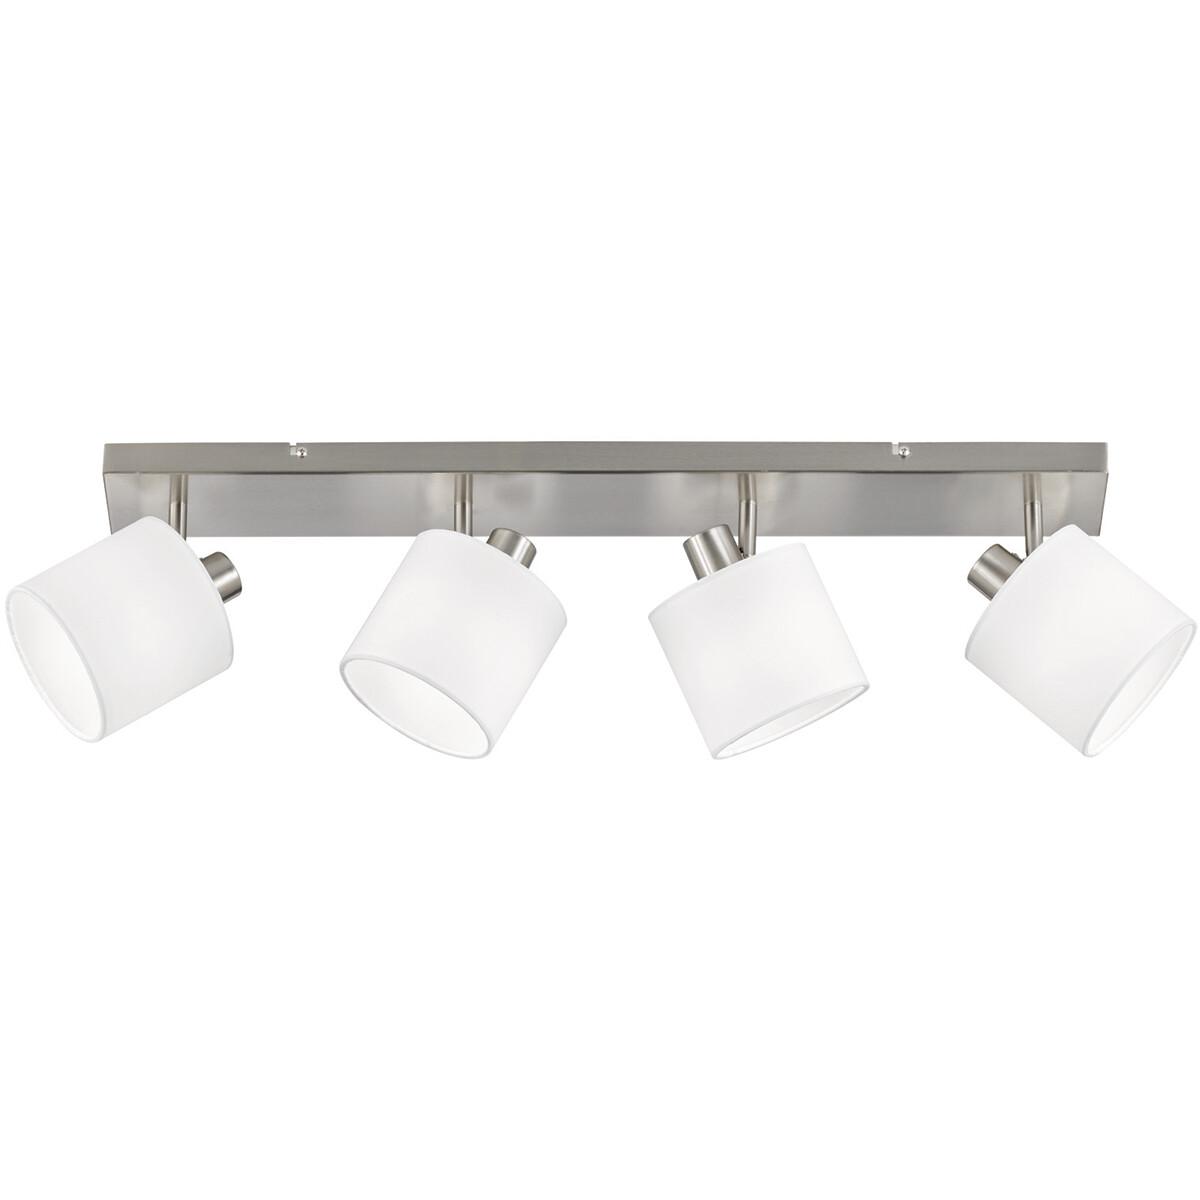 LED Plafondspot - Trion Torry - E14 Fitting - 4-lichts - Rechthoek - Mat Nikkel - Aluminium